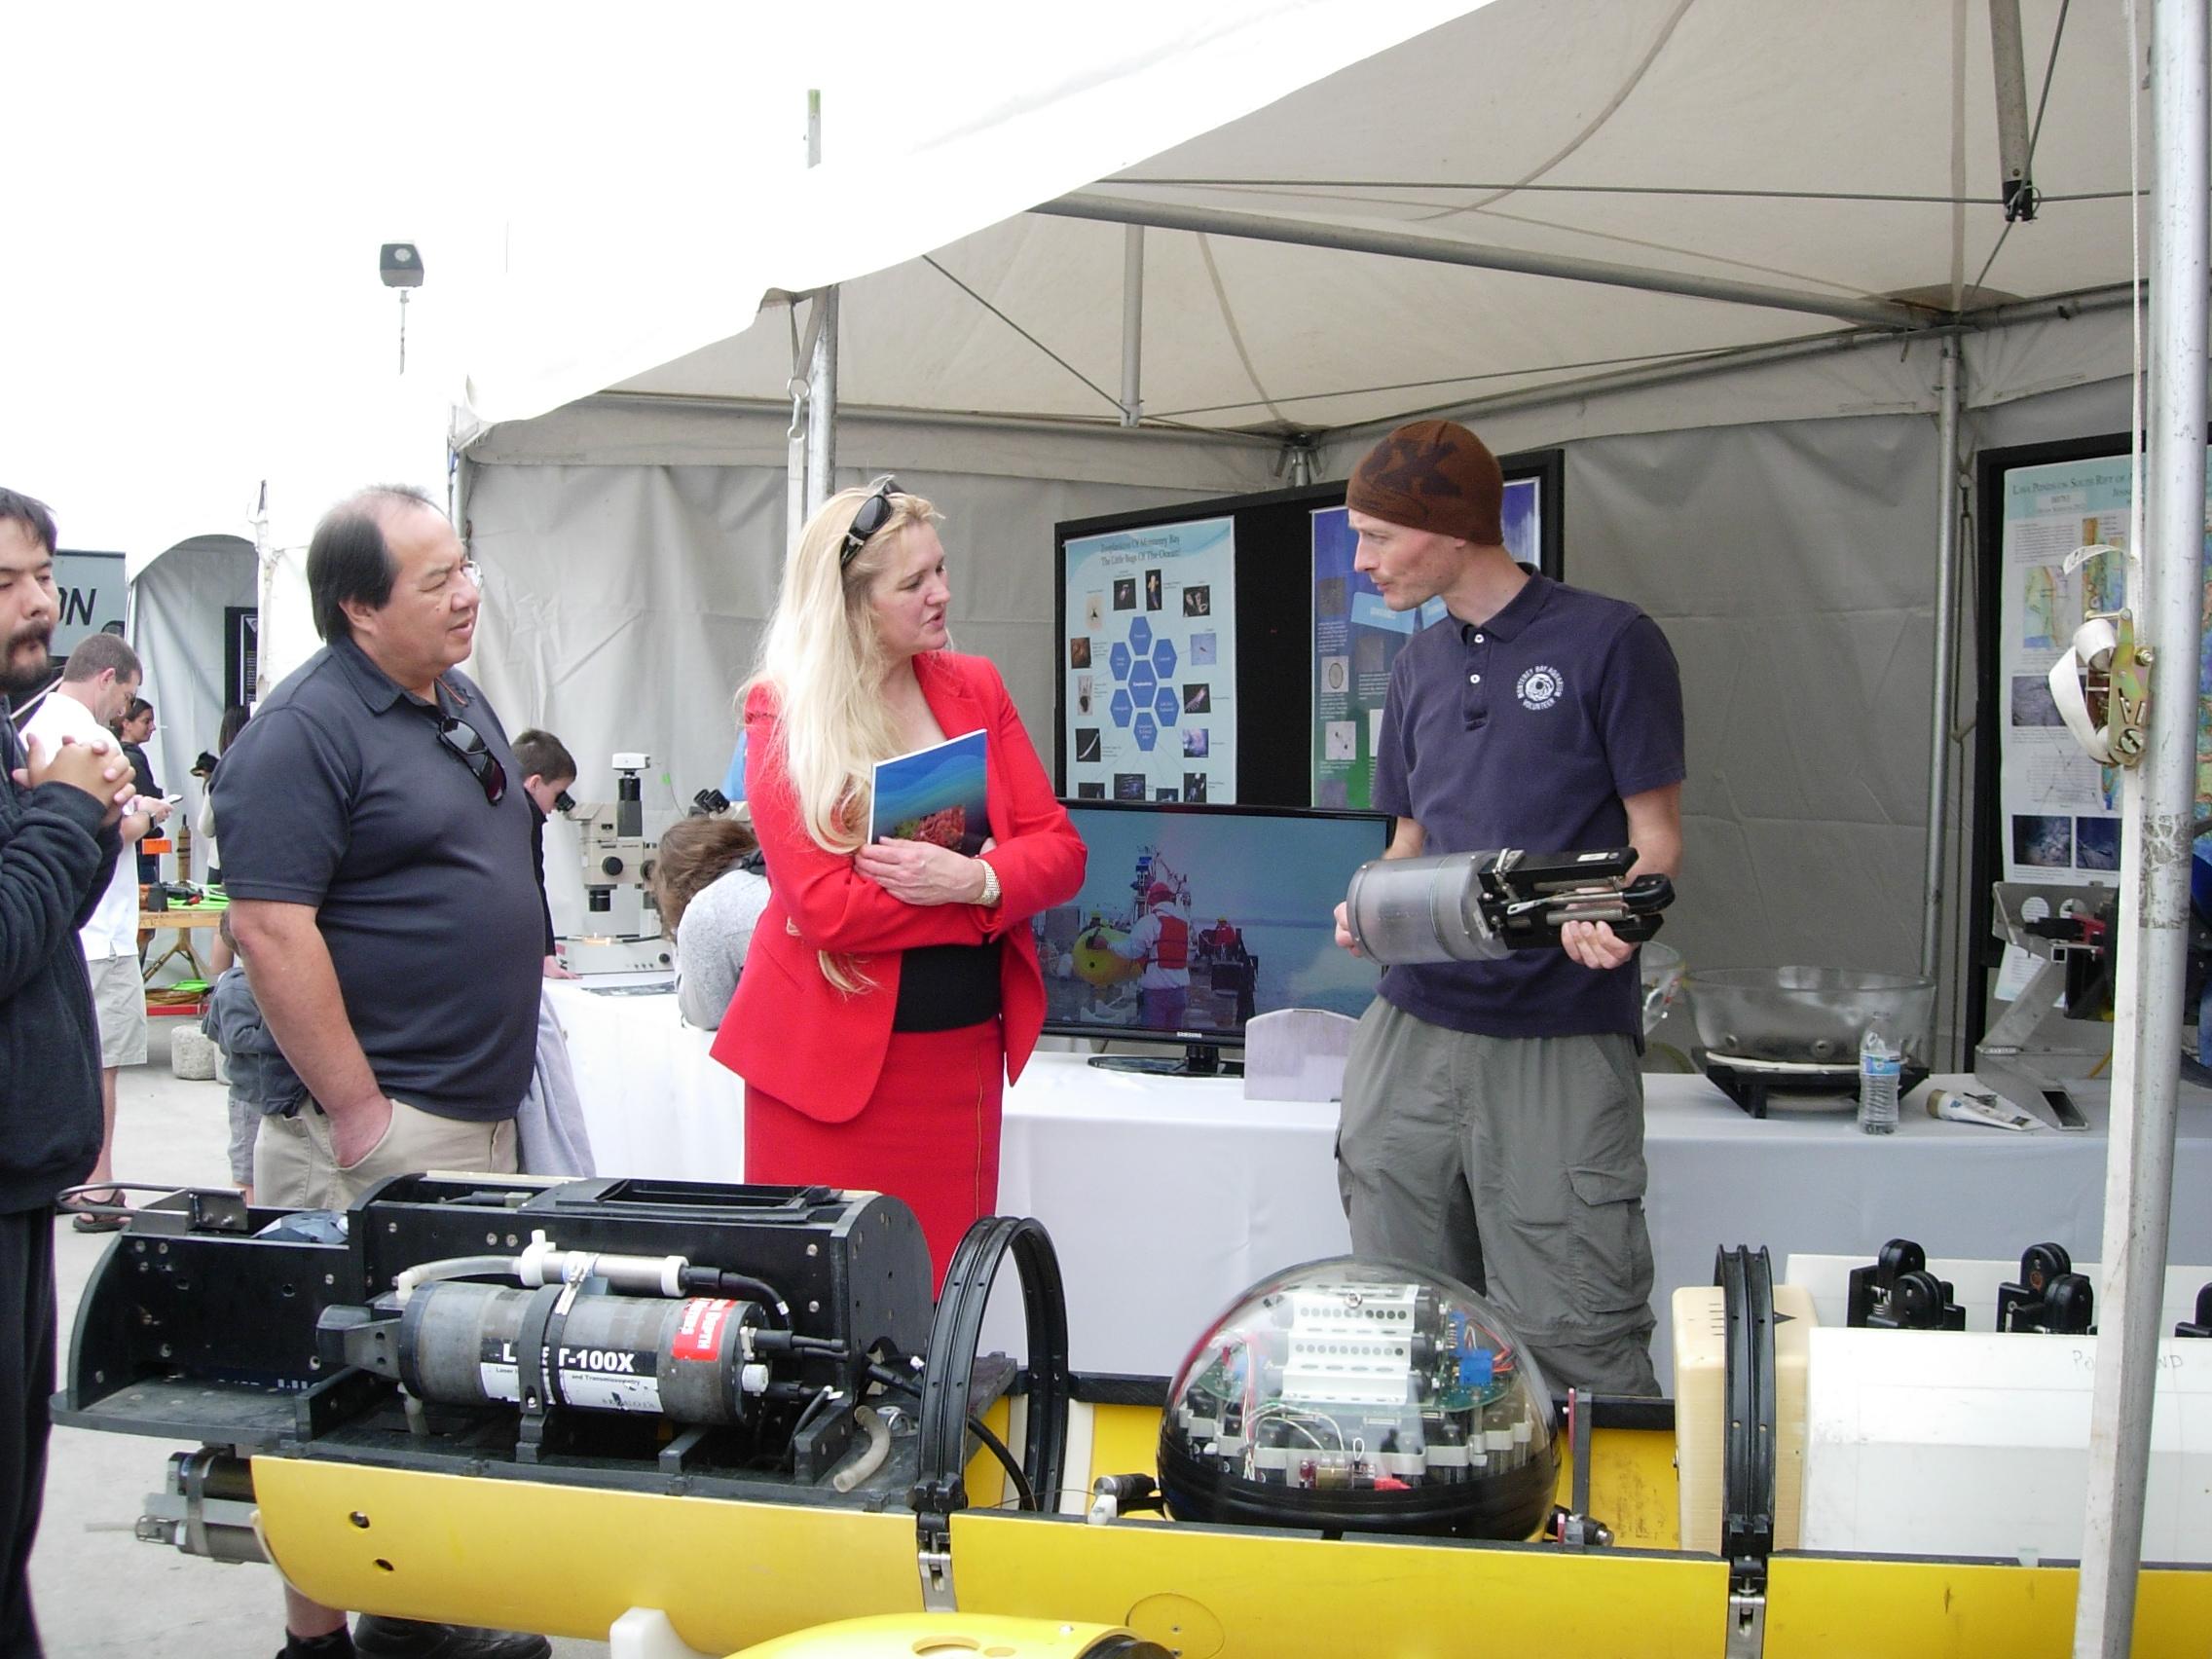 Autonomous underwater vehicles (AUVs)